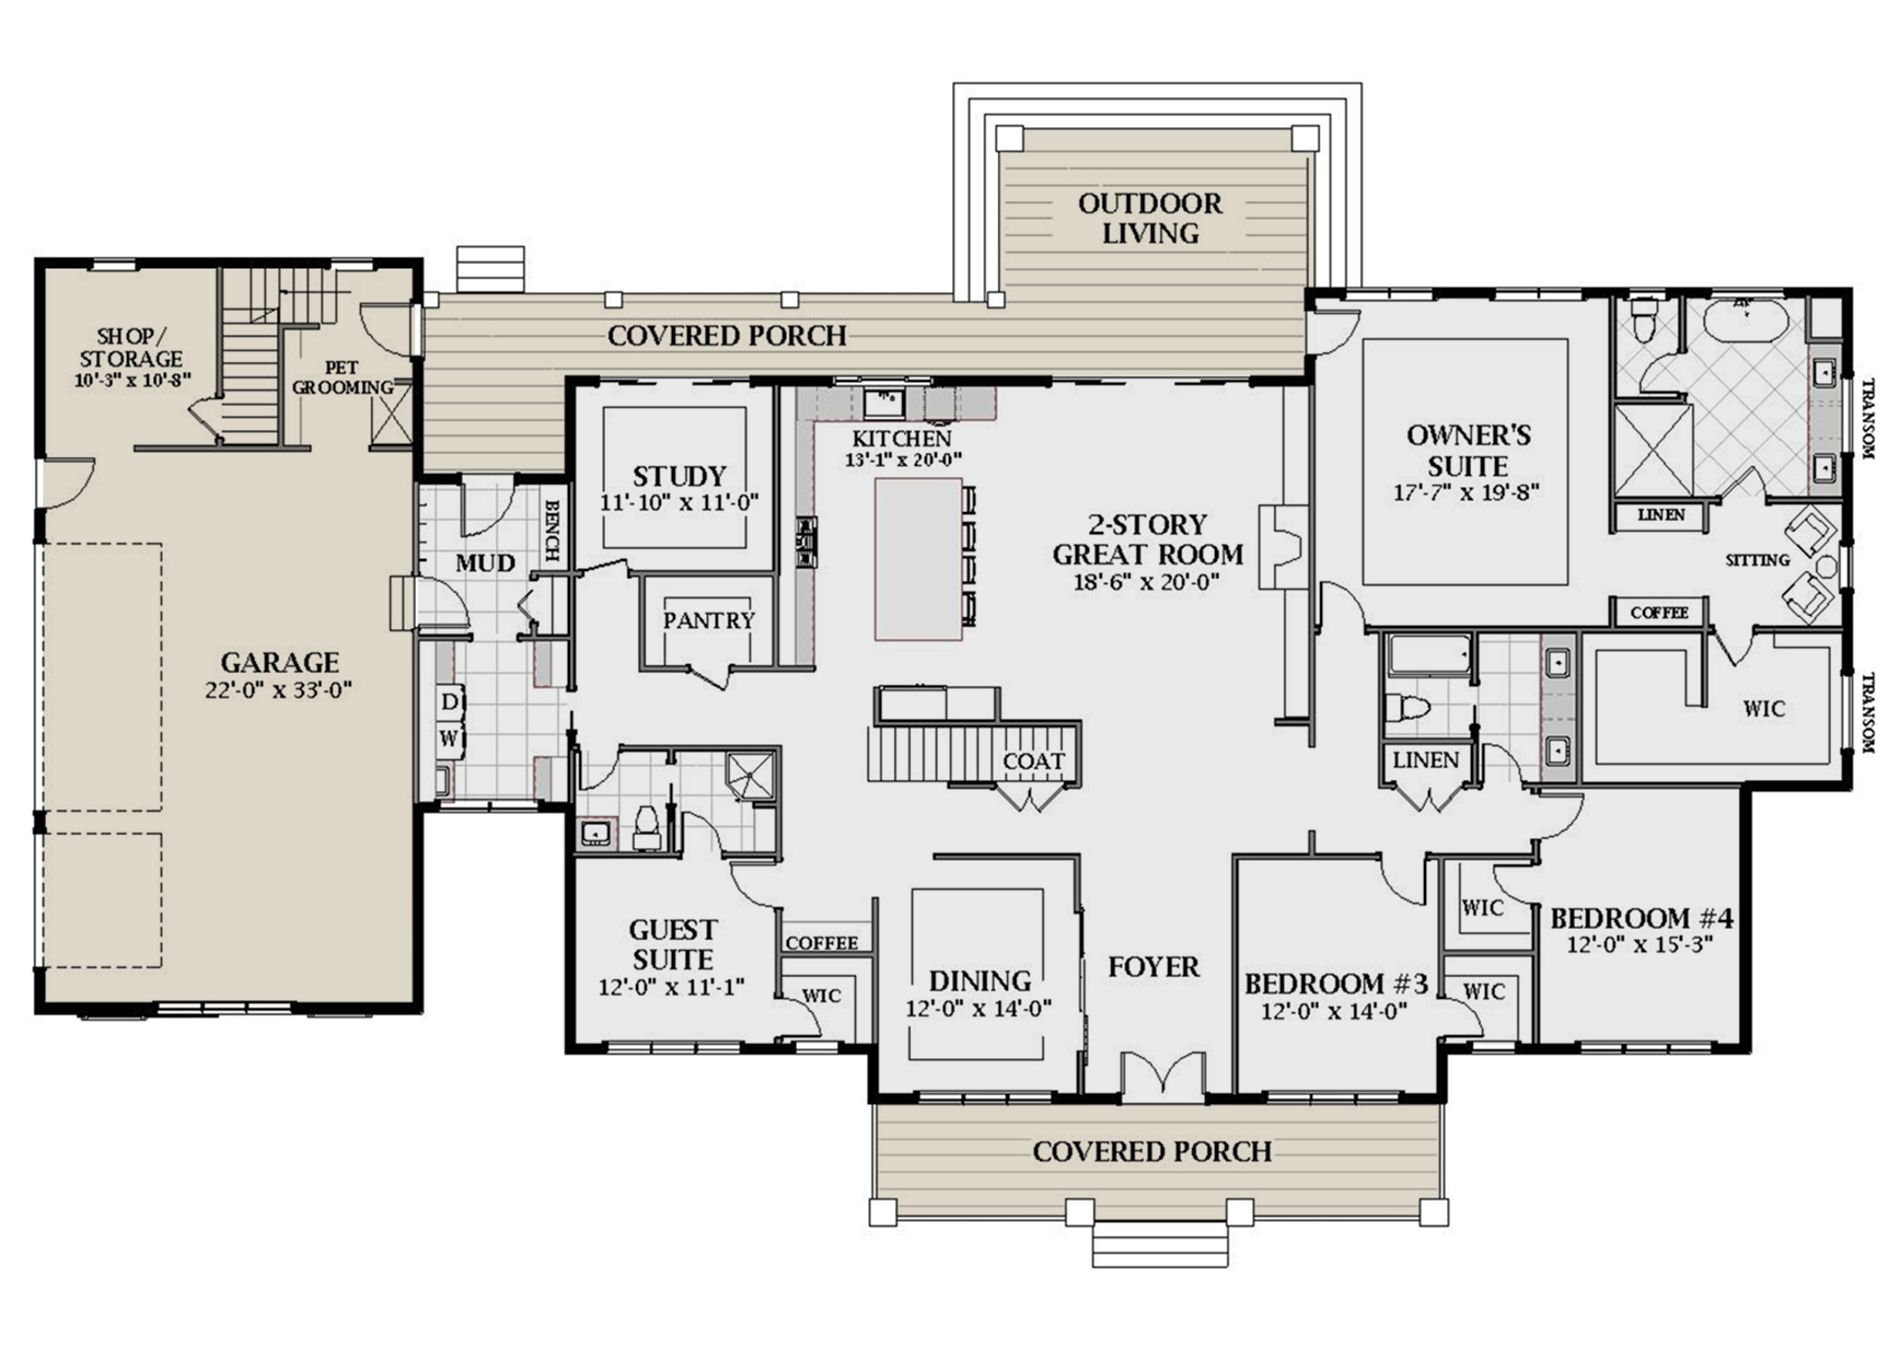 House Plan 6849 00089 Modern Farmhouse Plan 4 991 Square Feet 6 Bedrooms 5 5 Bathrooms In 2021 Modern Farmhouse Plans Farmhouse Plans Family House Plans